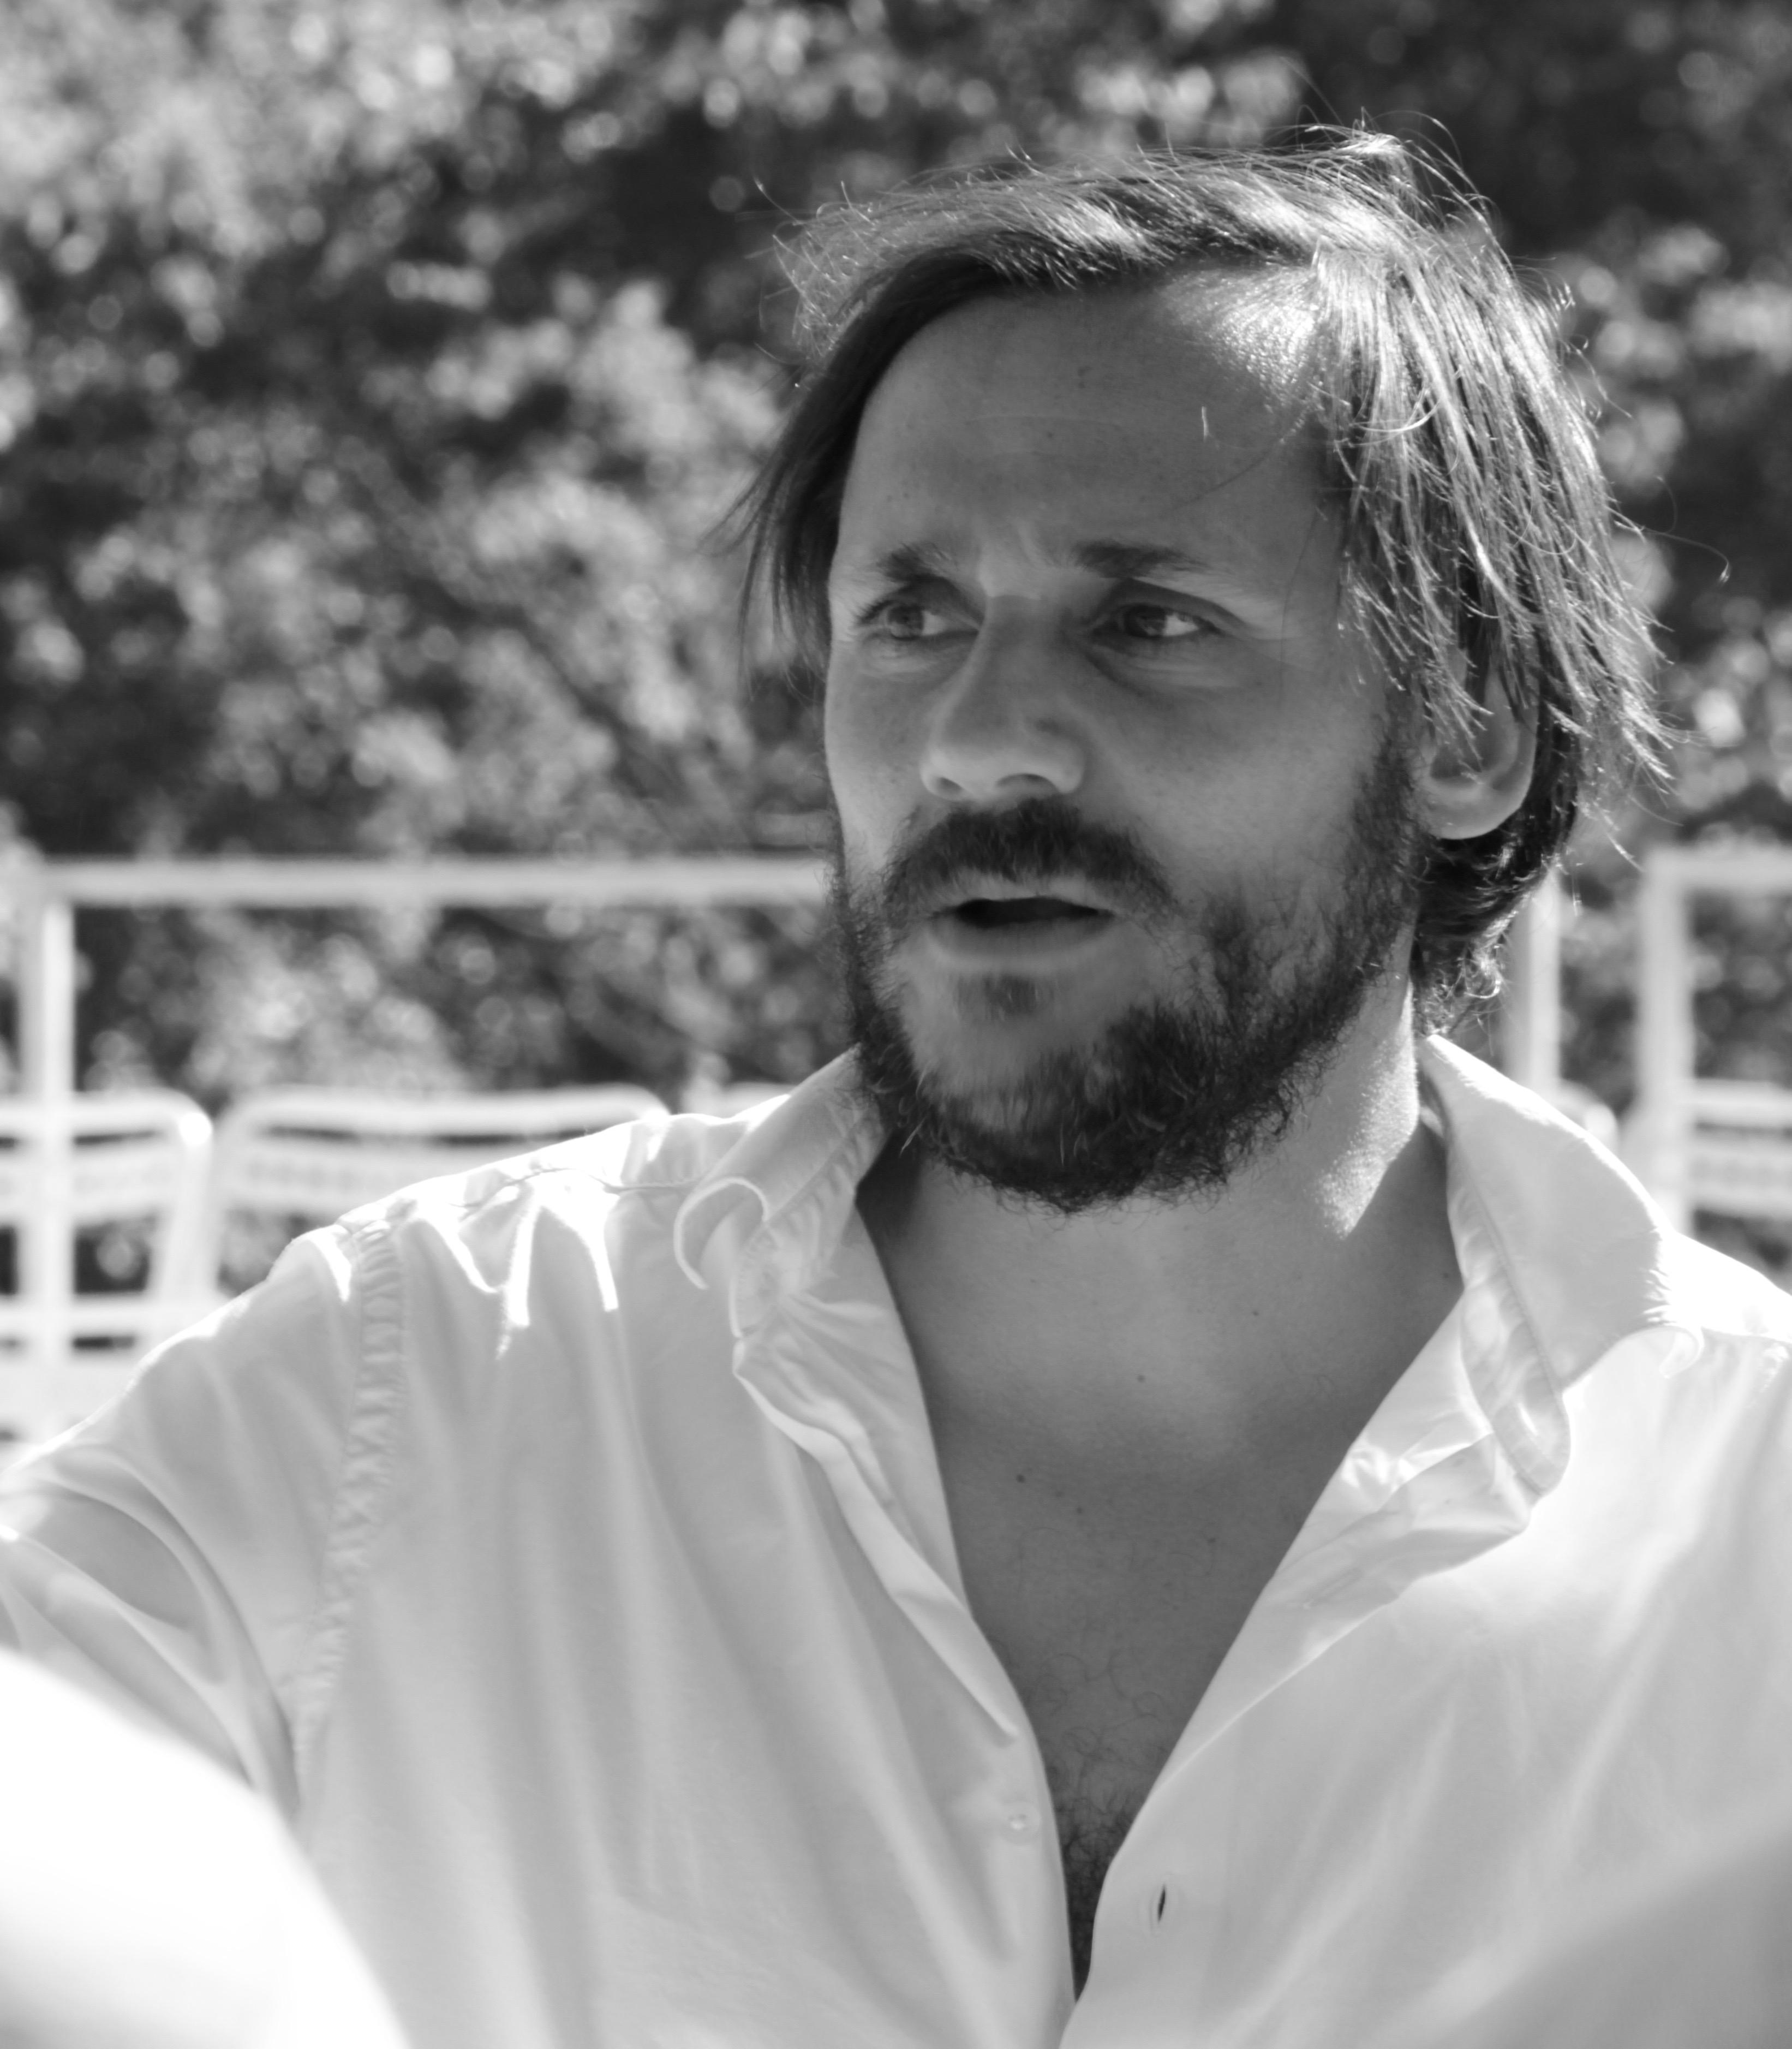 Jean-Baptiste Sastre